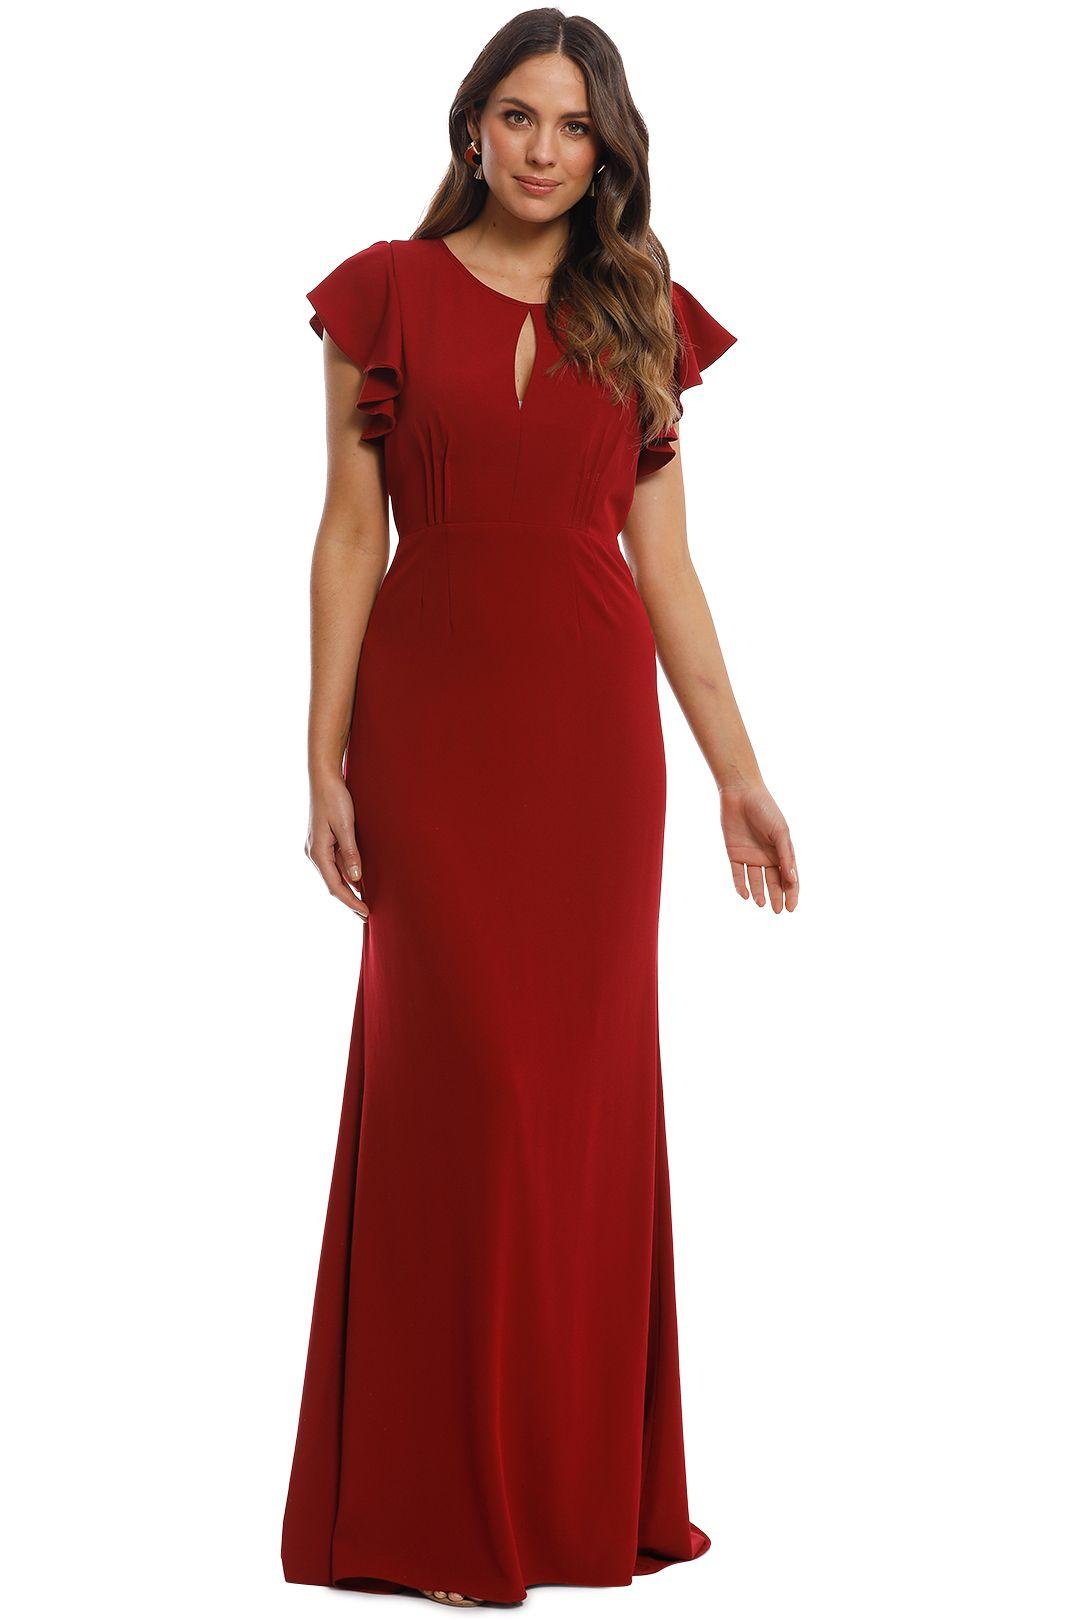 Tania Olsen - Stella Gown - Merlot - Front